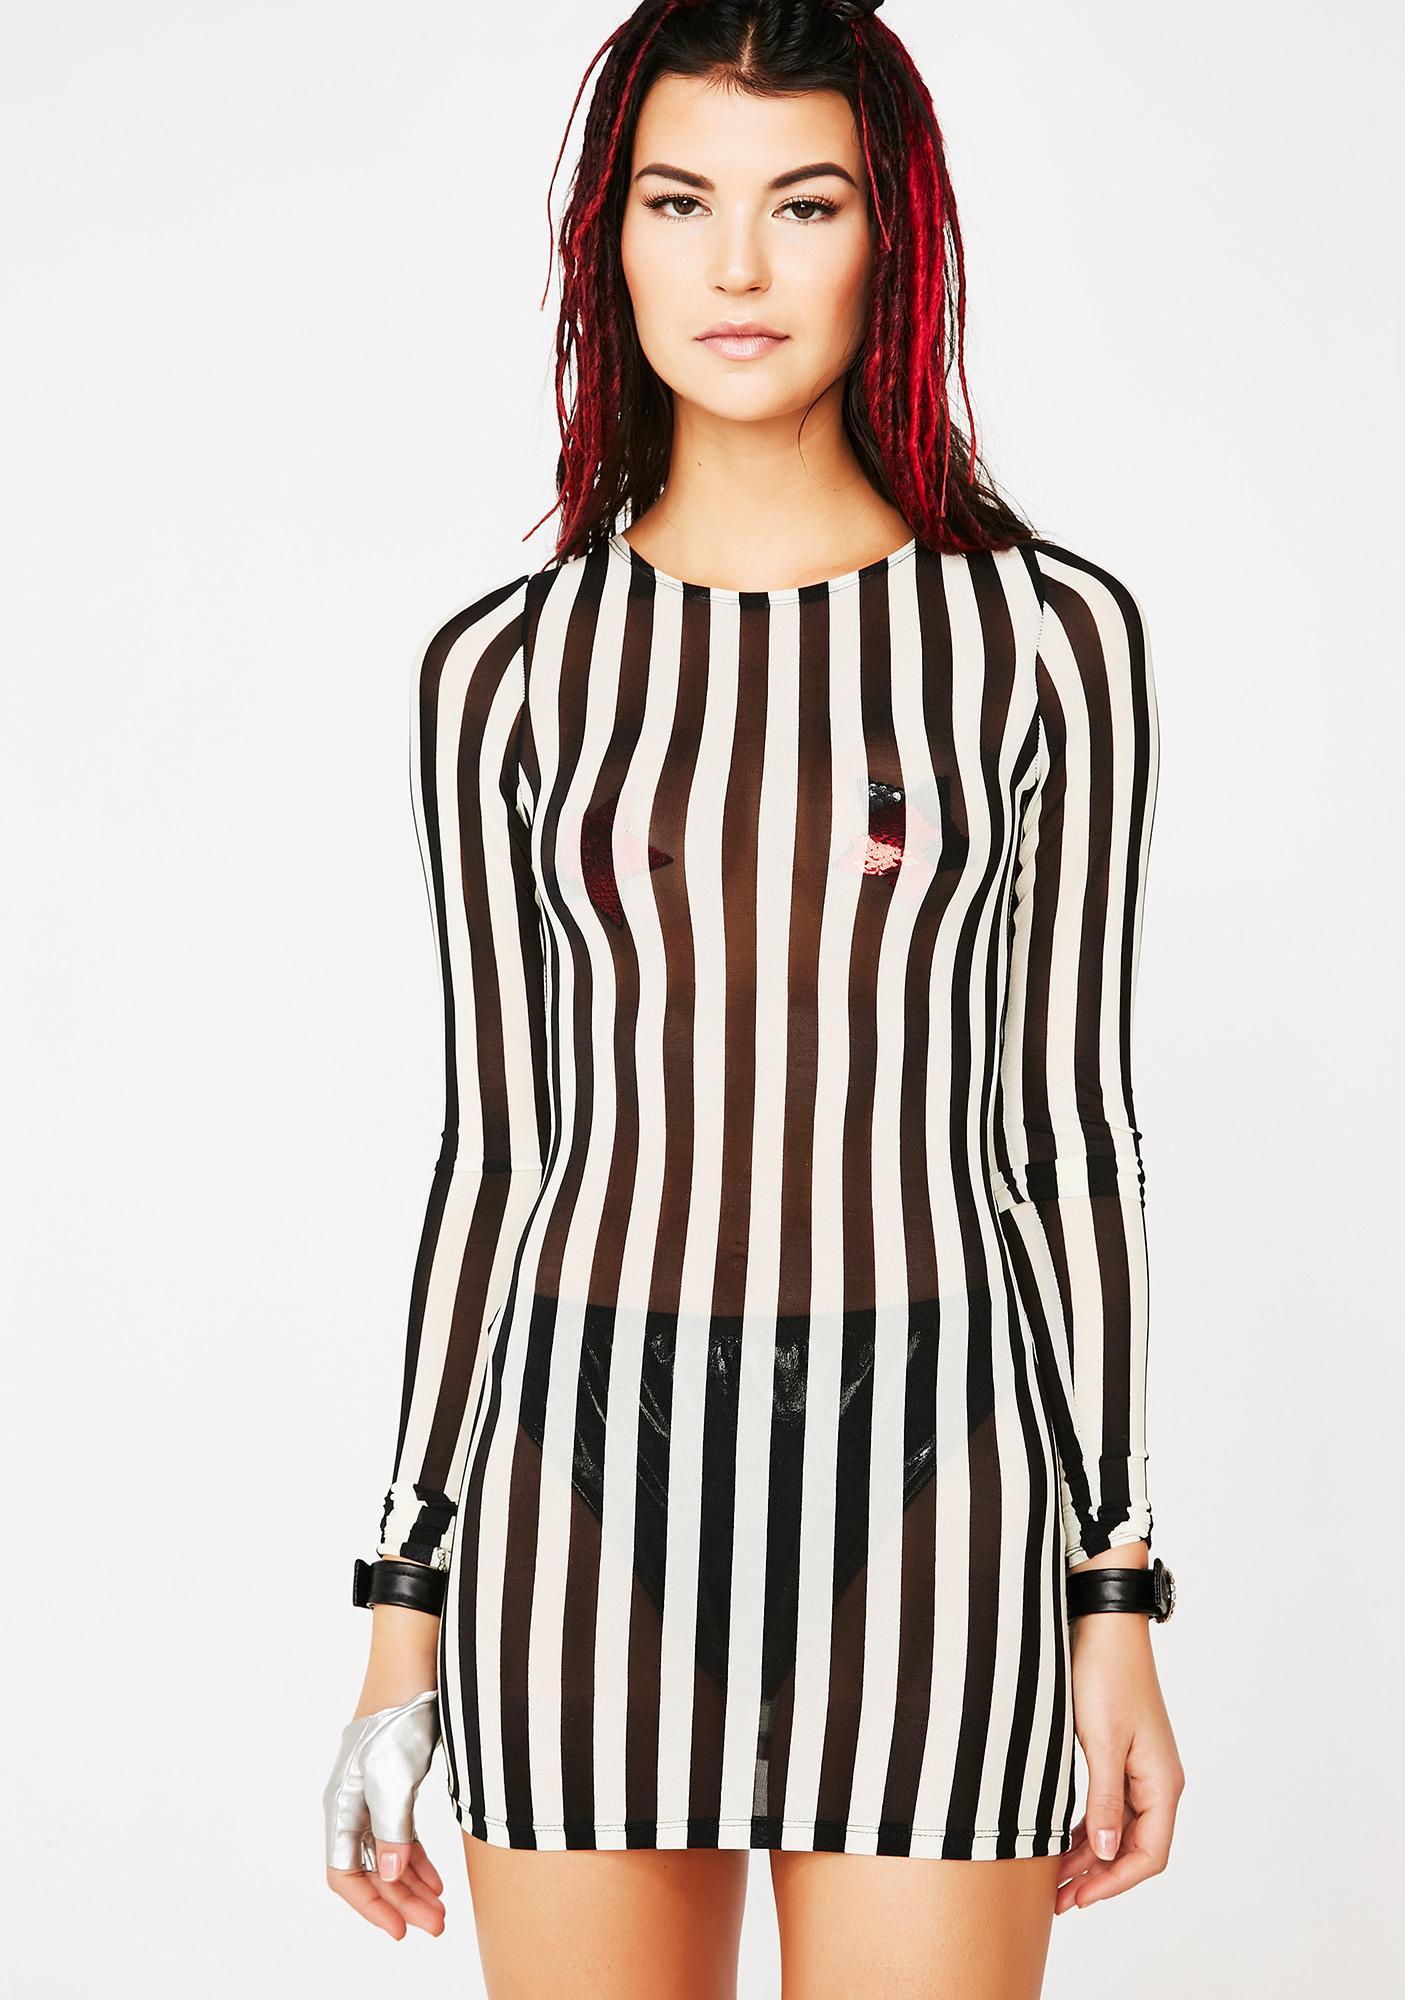 Ivy Berlin Kleo Dress